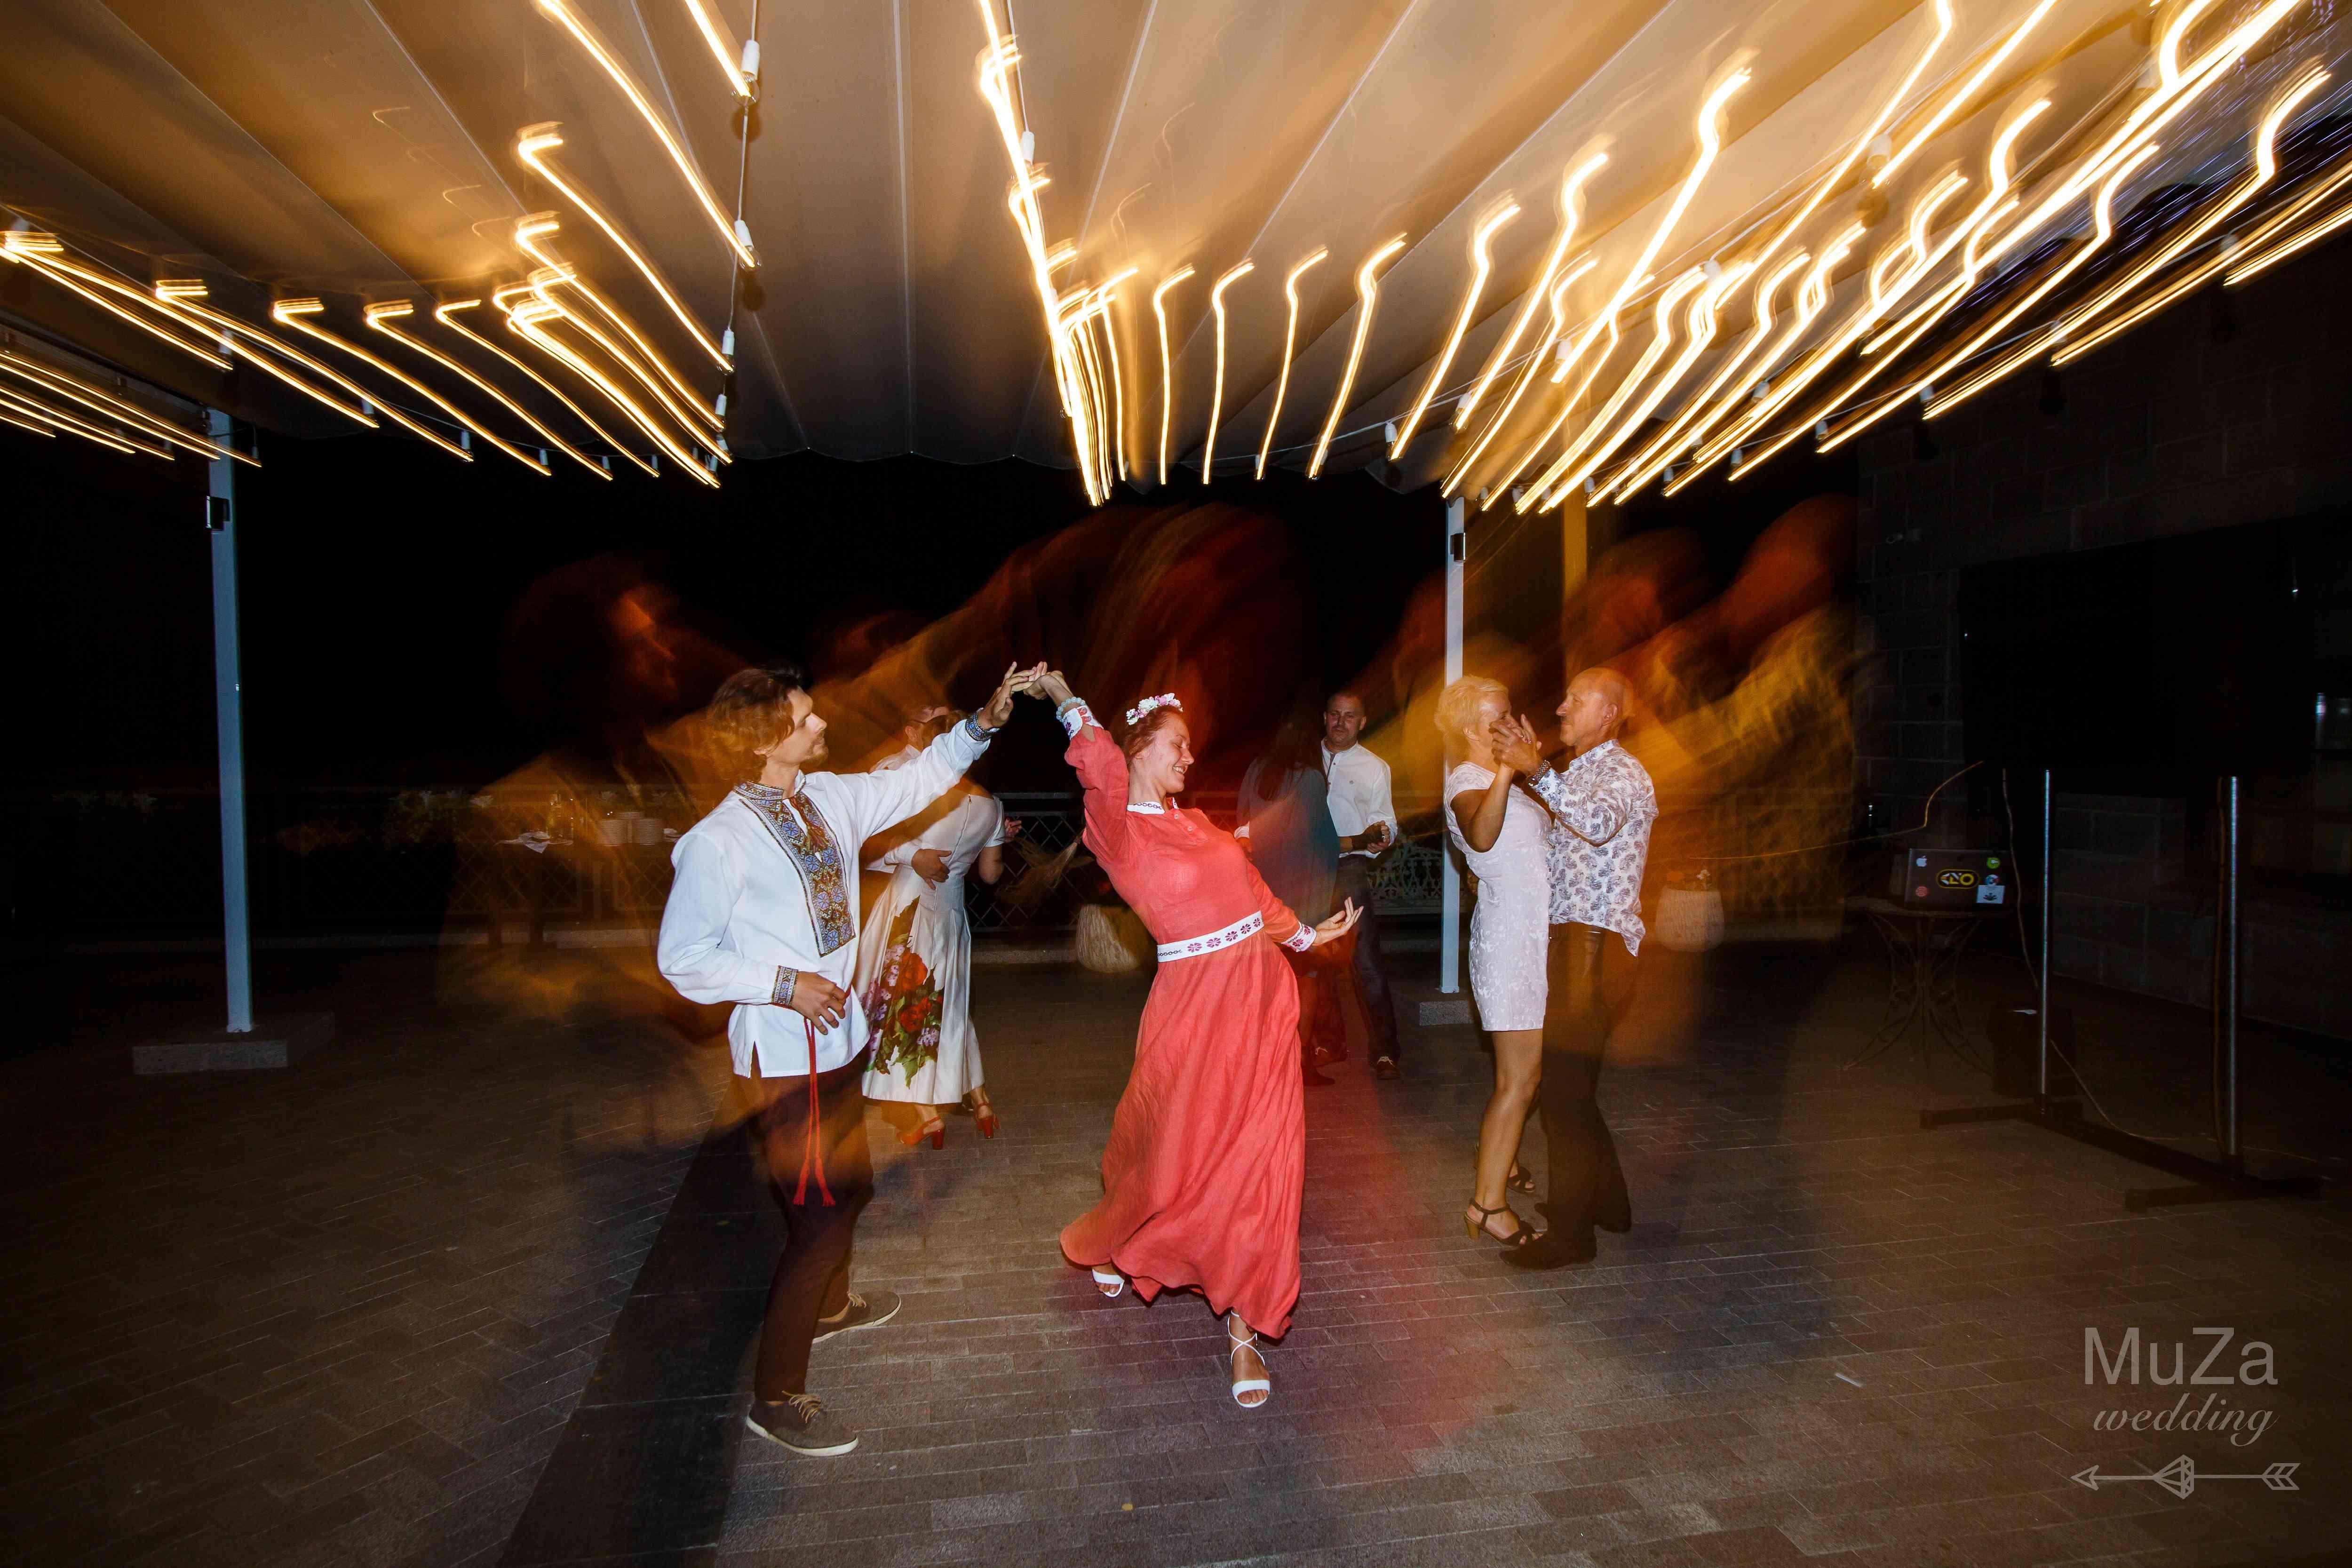 танцы, гости, свадьба, лампочки